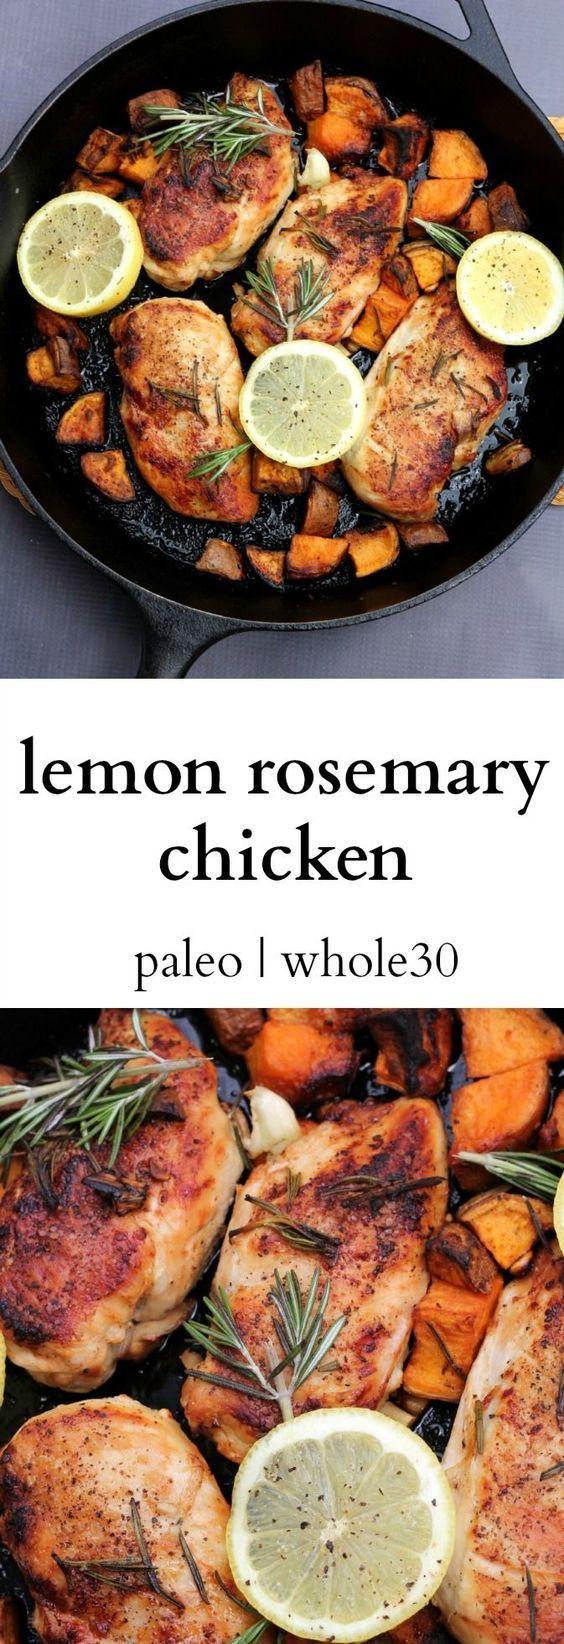 ... Lemon Rosemary Chicken on Pinterest | Rosemary Chicken, Chicken and